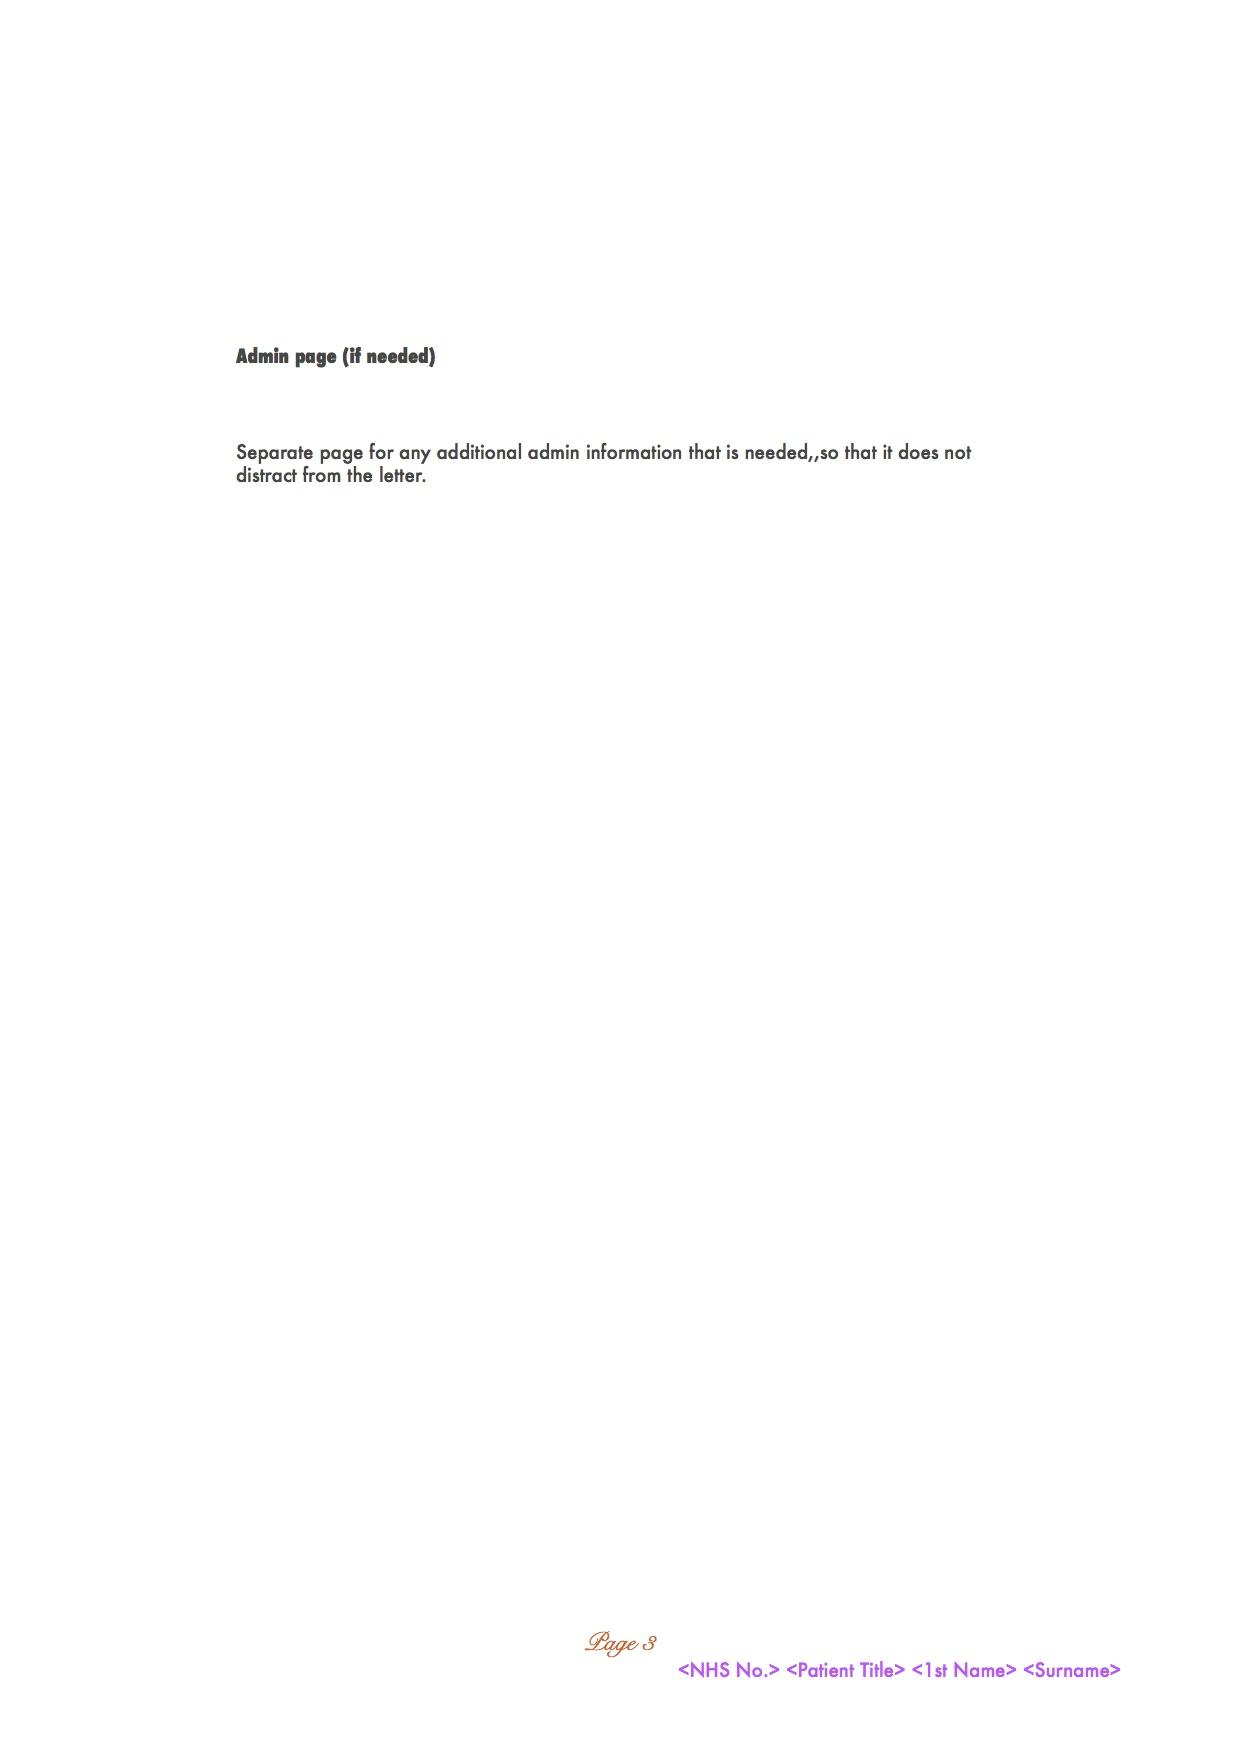 Cancer gpknowhow woodingdean brighton hove referral letter template draft minimum dataset v1 2710 p3 altavistaventures Images